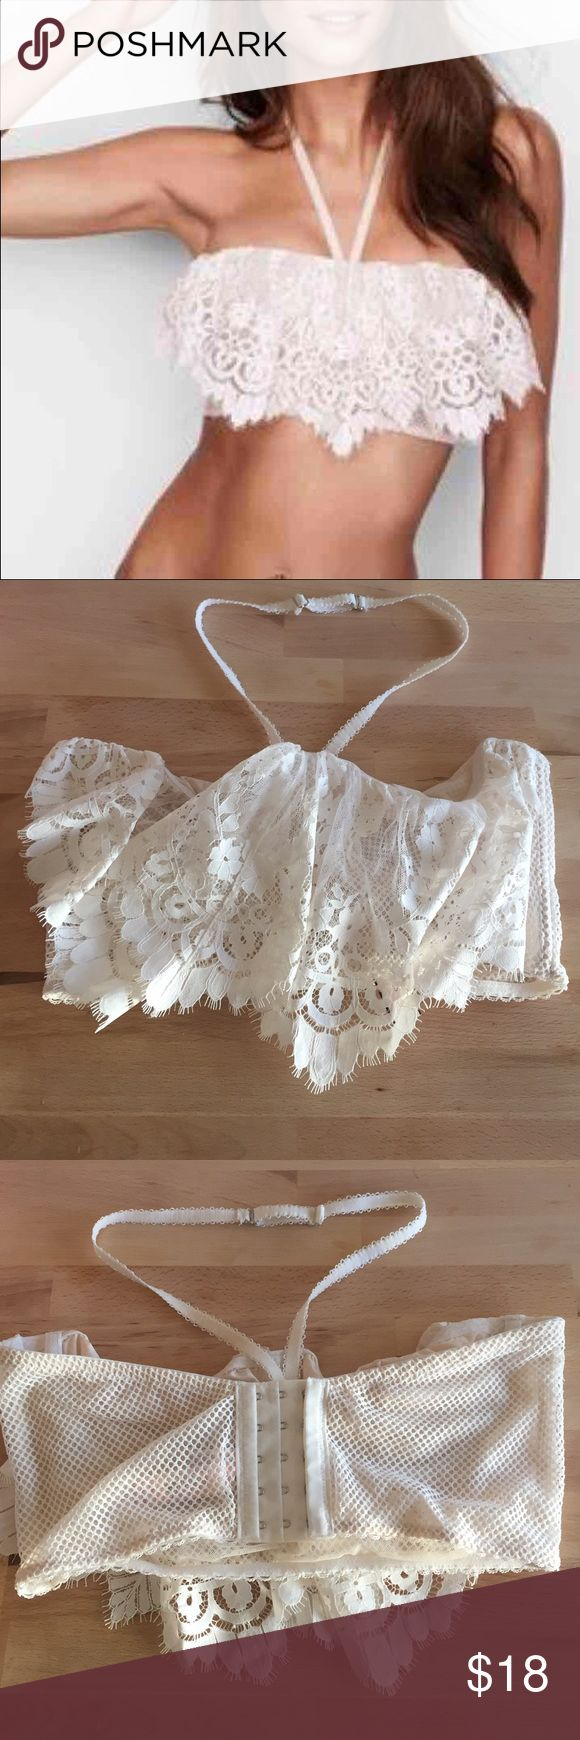 New! 36D Victoria's Secret halter unlined bra Brand new! Victoria's Secret halter unlined bra. Size 36D Victoria's Secret Intimates & Sleepwear Bras